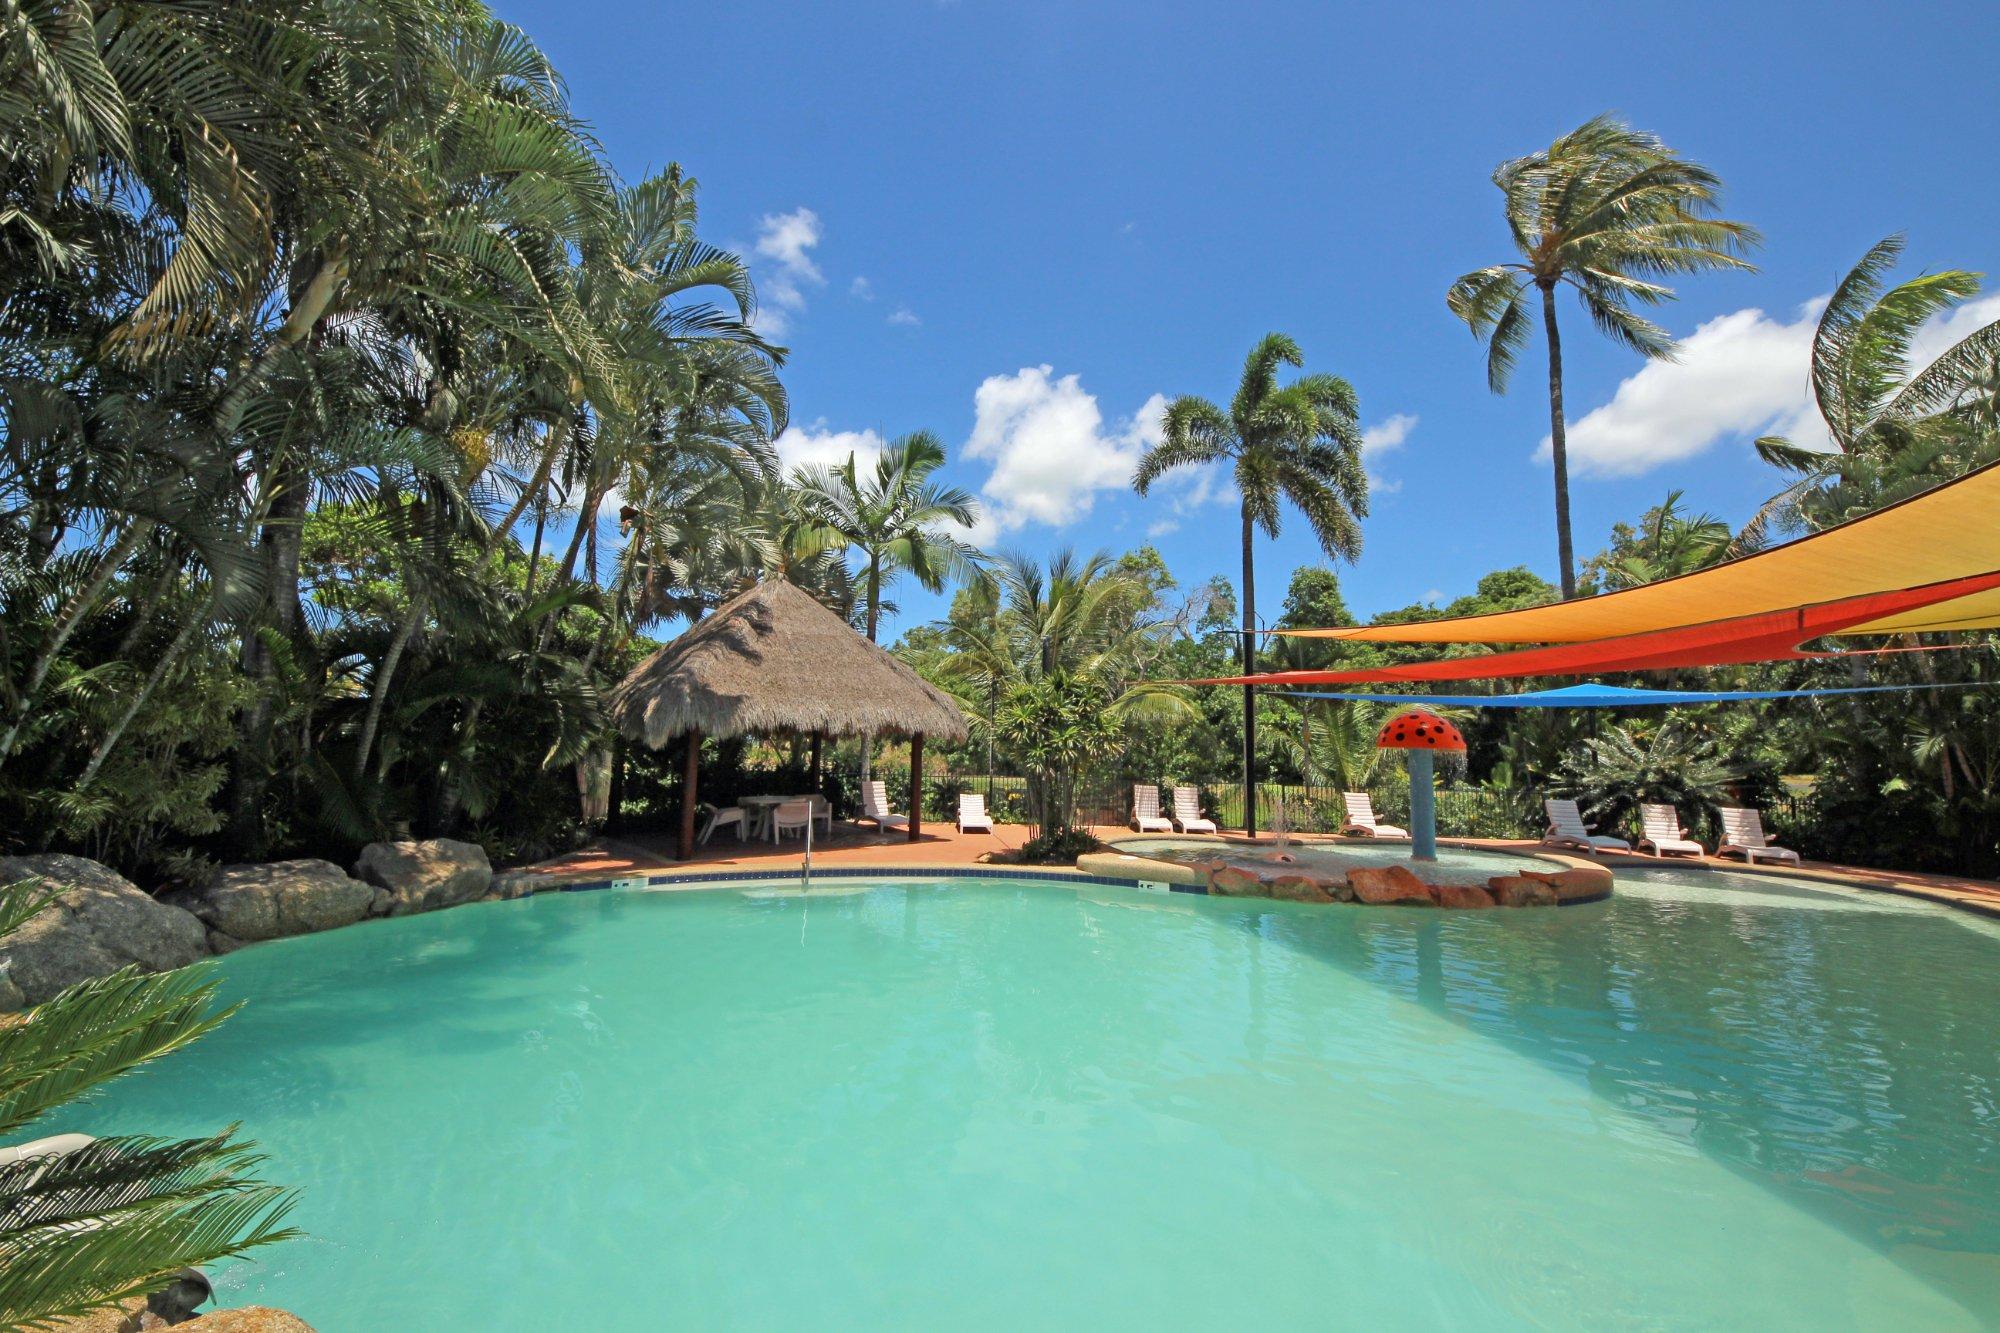 Beachcomber Coconut Holiday Park